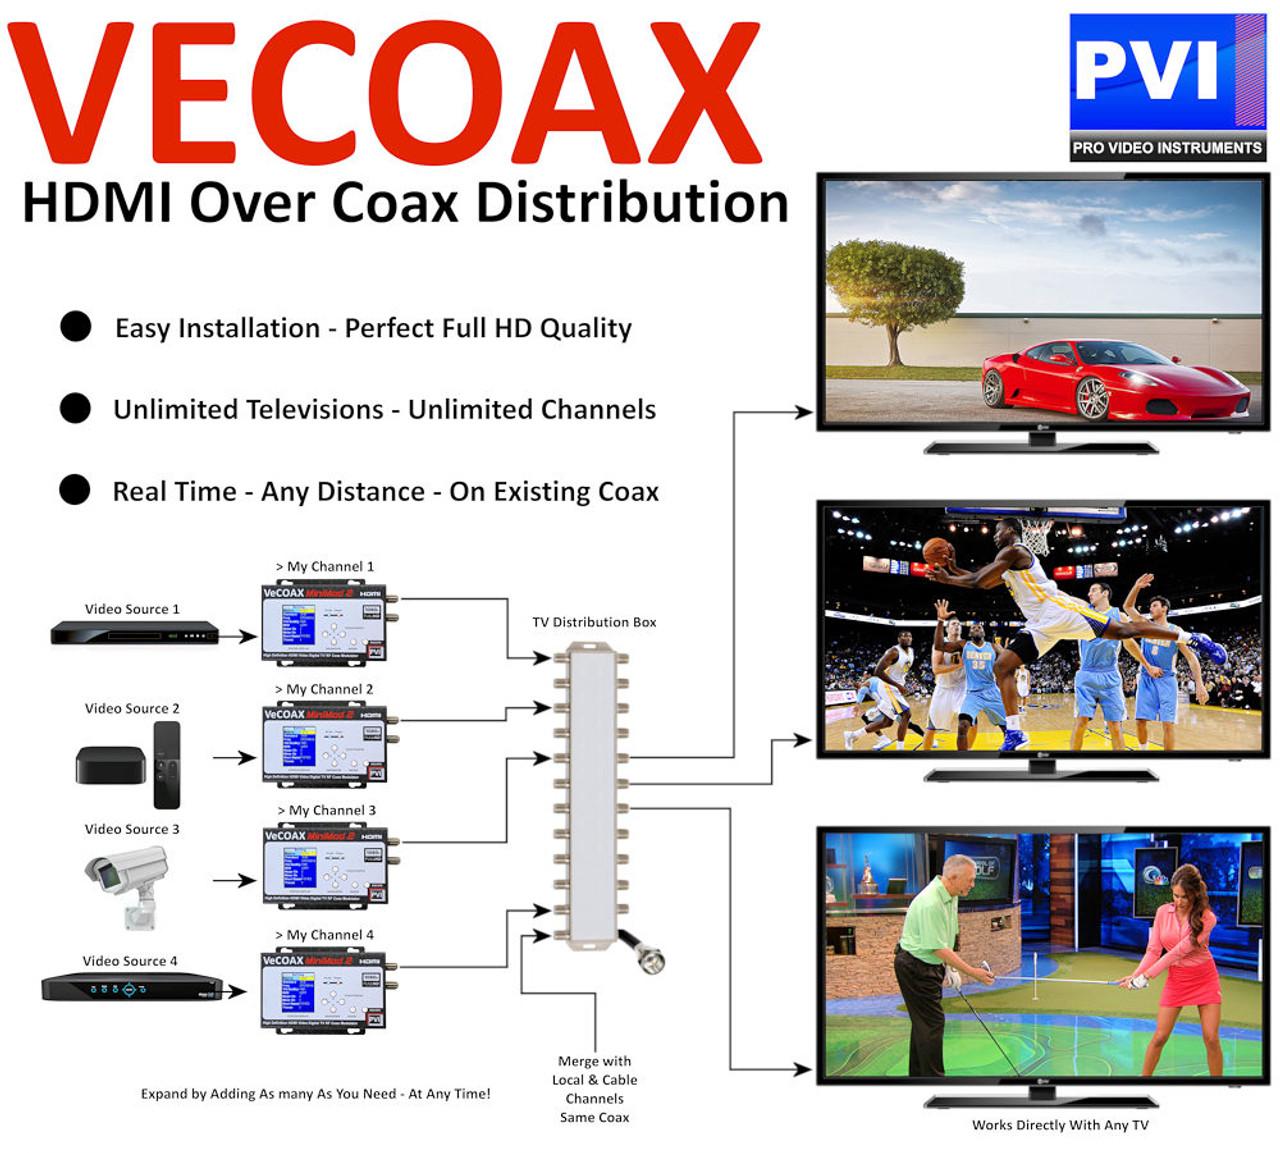 ProVideoInstruments VeCOAX MiniMod-2 1080p Professional HDMI to RF Modulator